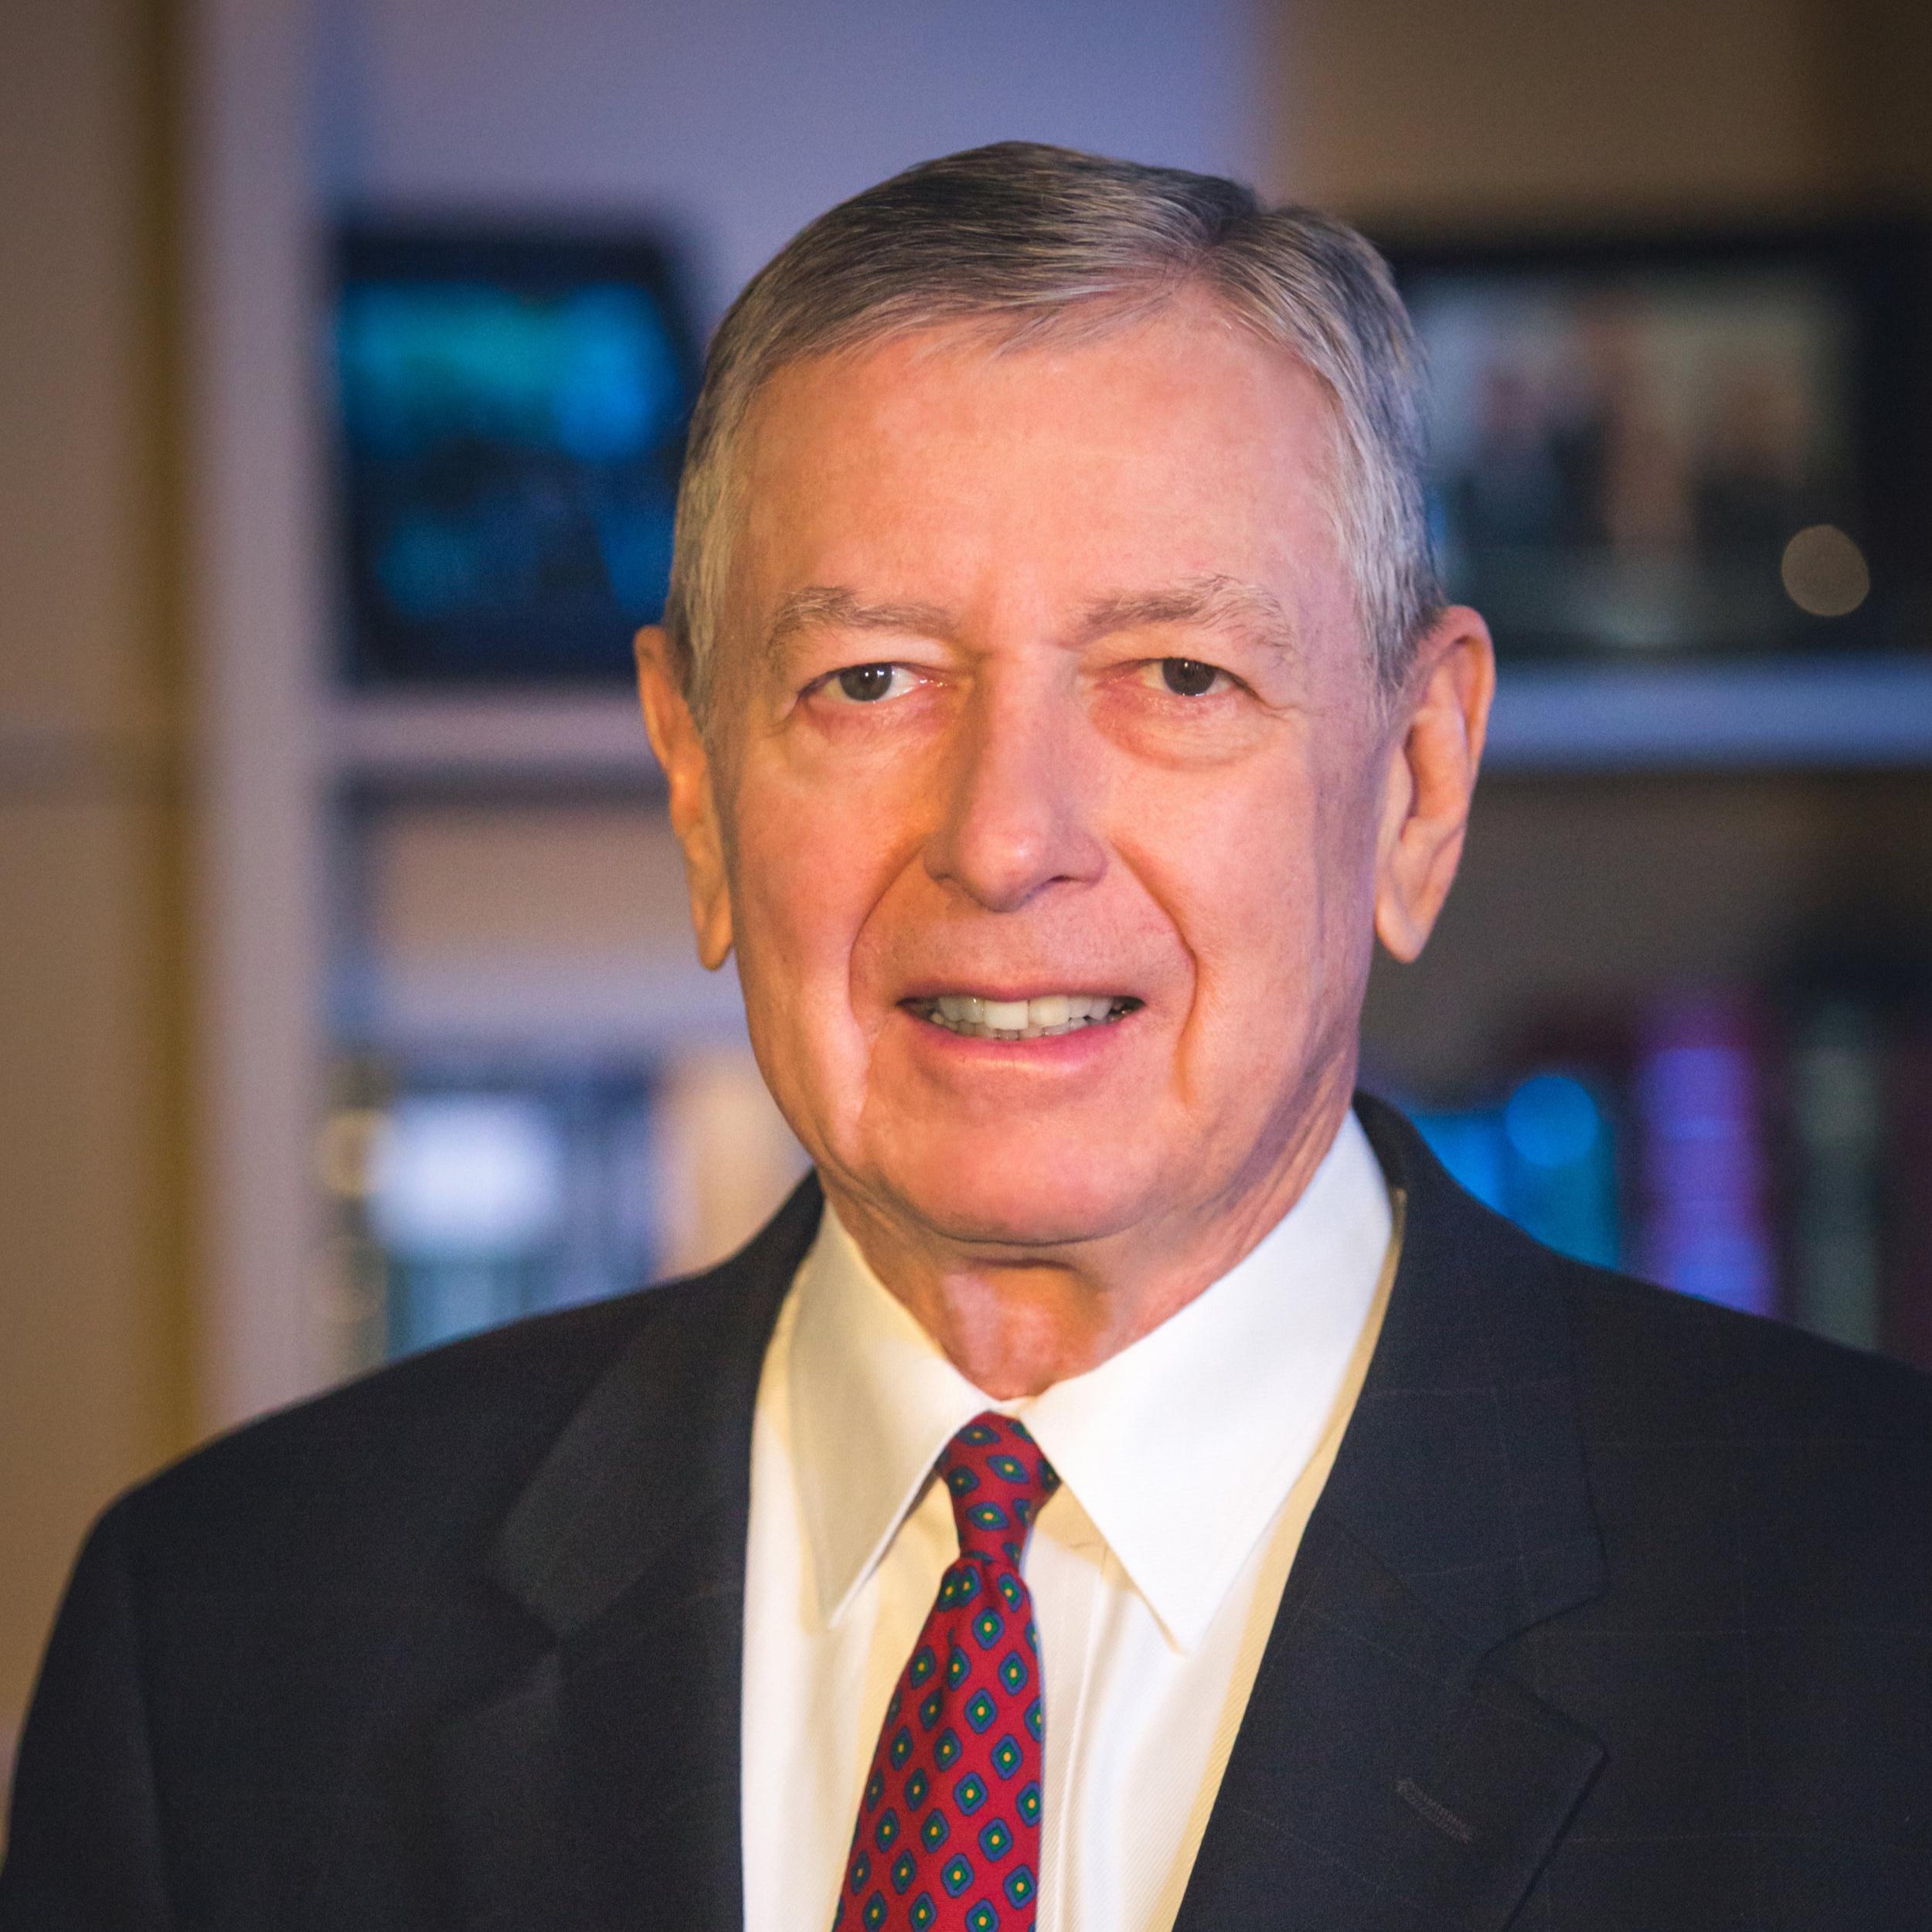 The Honorable John D. Ashcroft